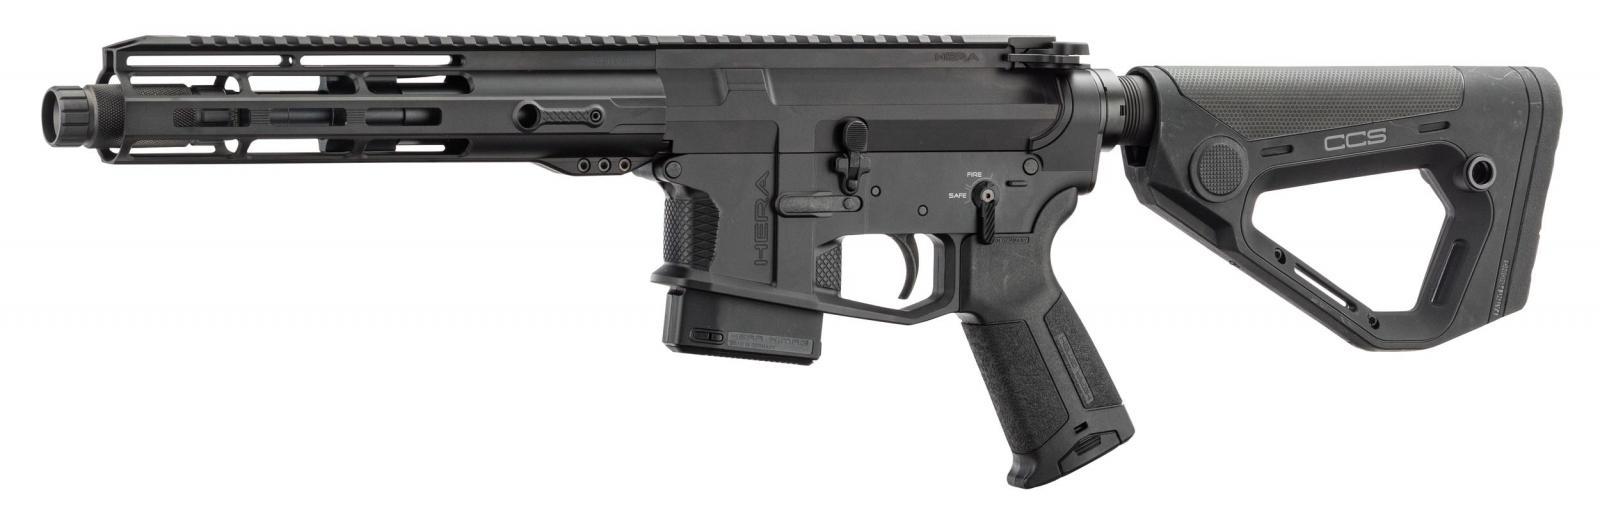 "Carabine type AR15 HERA ARMS 15TH LS40/US010 7.5"""